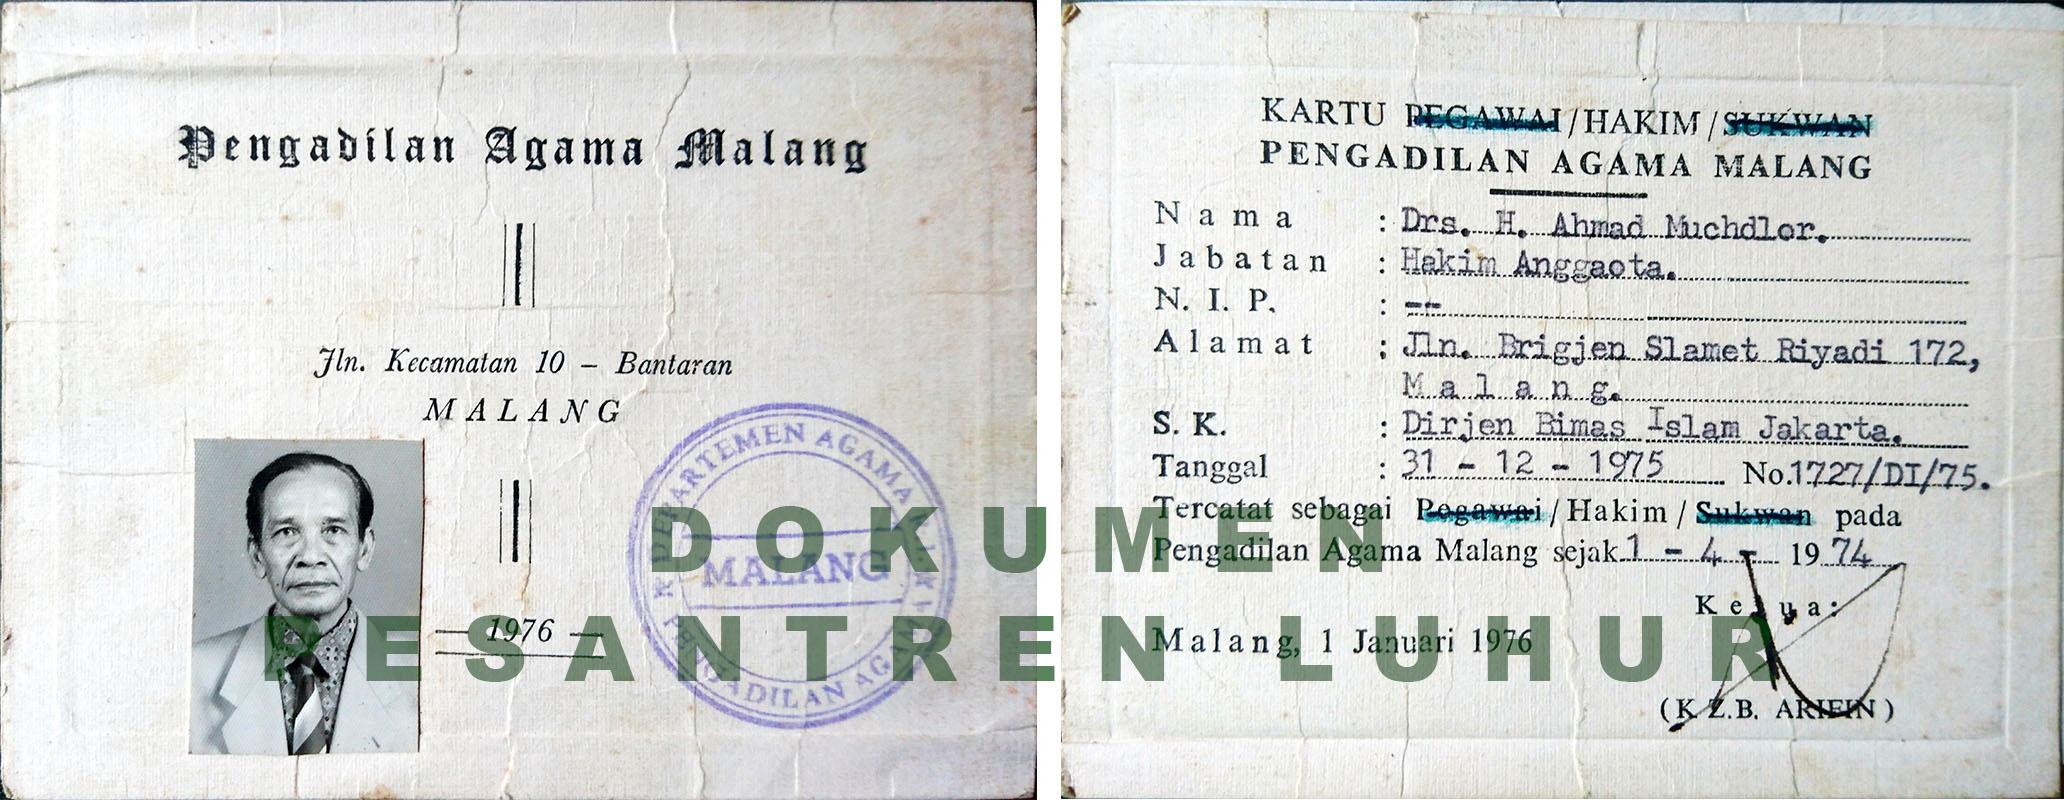 Salah satu dokumen Pesantren Luhur berupa Kartu Hakim Pengadilan Agama Malang milik Abah Mudlor